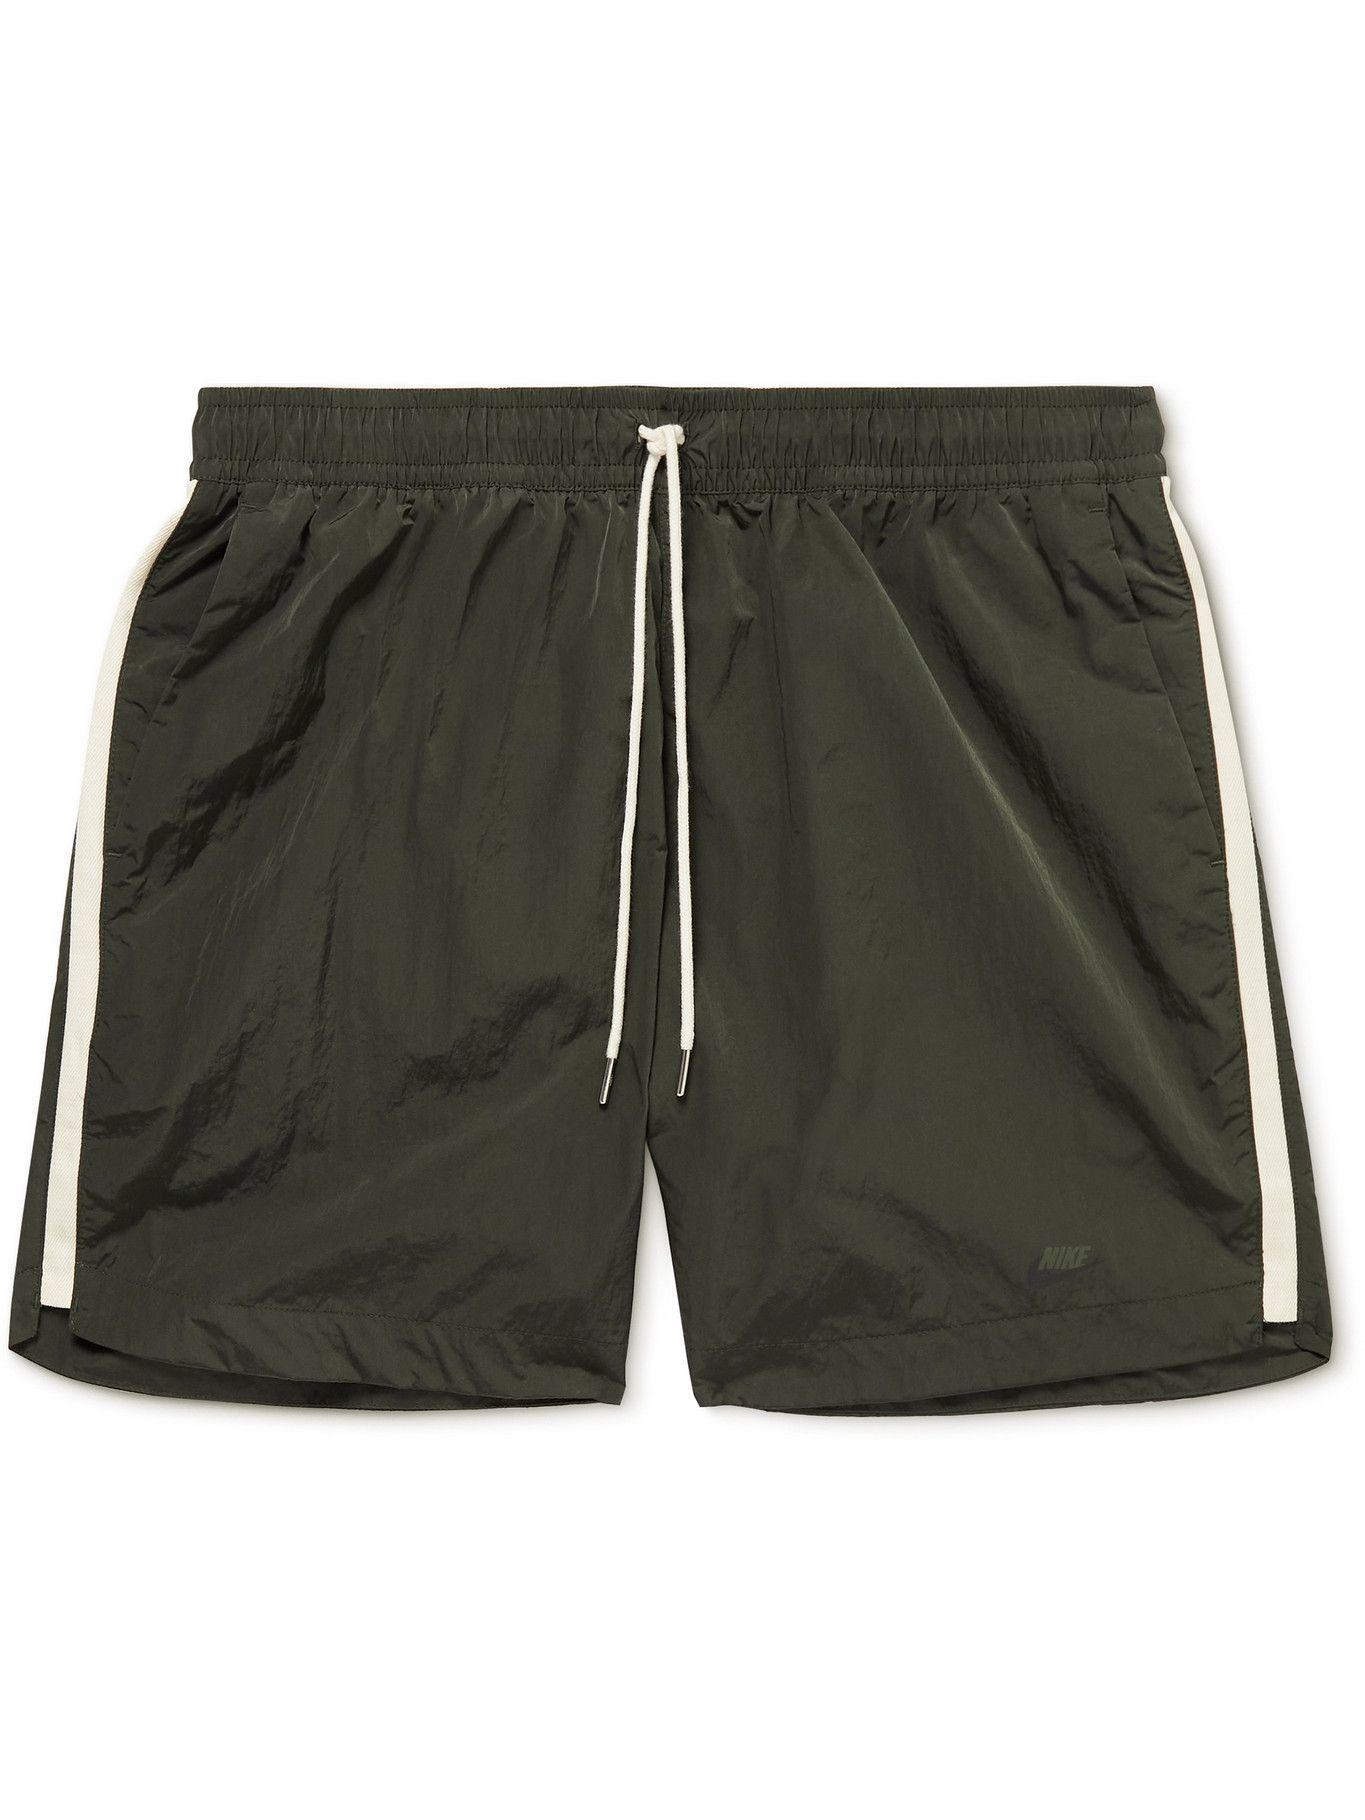 Photo: Nike - Sportswear Twill-Trimmed Nylon Drawstring Shorts - Green